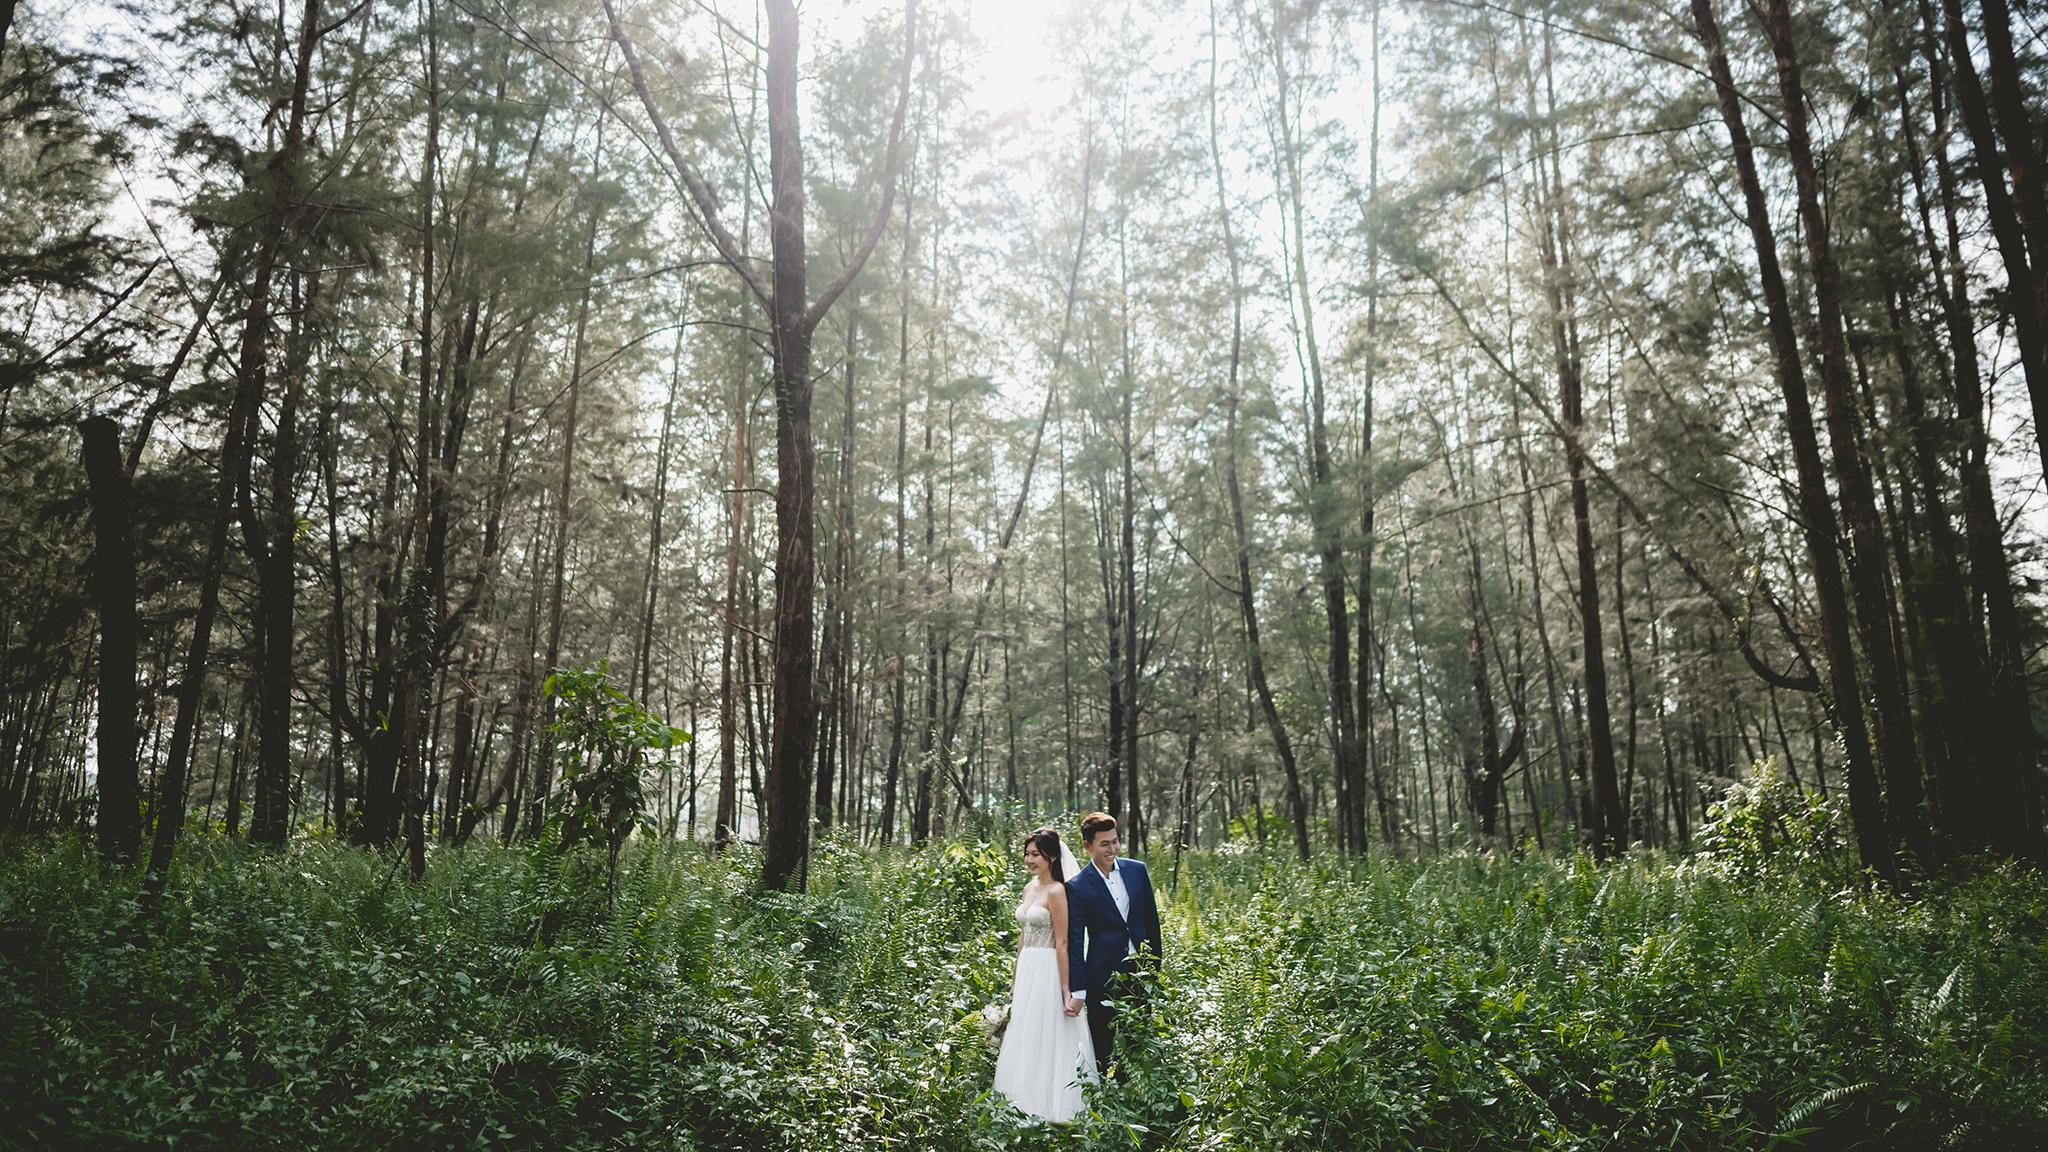 Pre wedding cony island 016.JPG